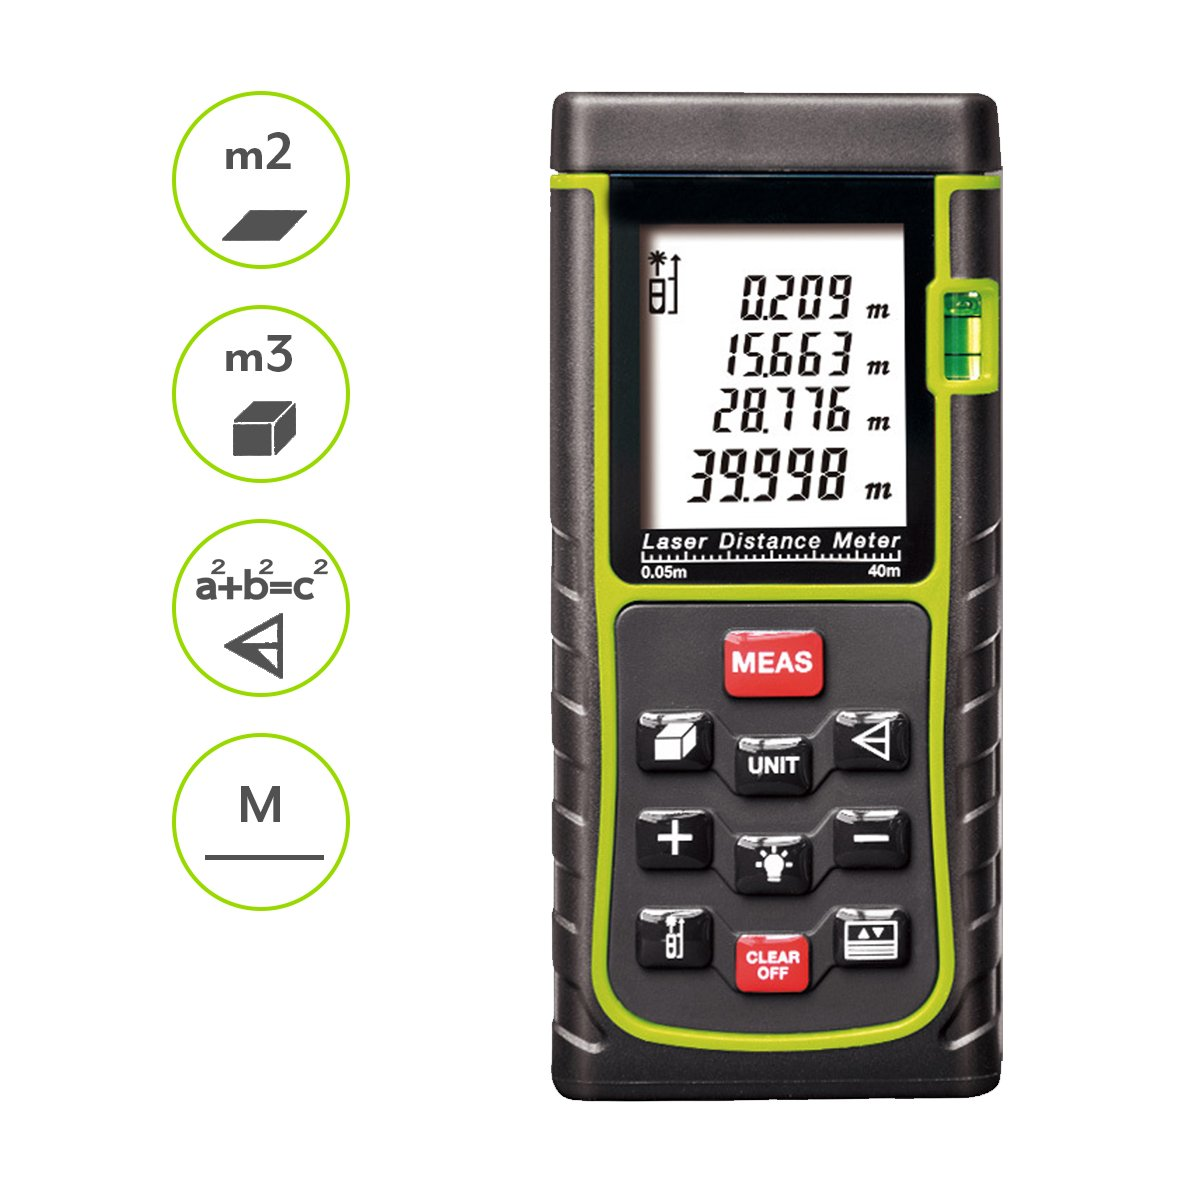 Distance Laser Meter, Handheld Range Finder Meter, Portable Measuring Device, Area/Volume/Distance/Pythagoras Calculation, Measurement Memory Recall, Tape Measure (40)